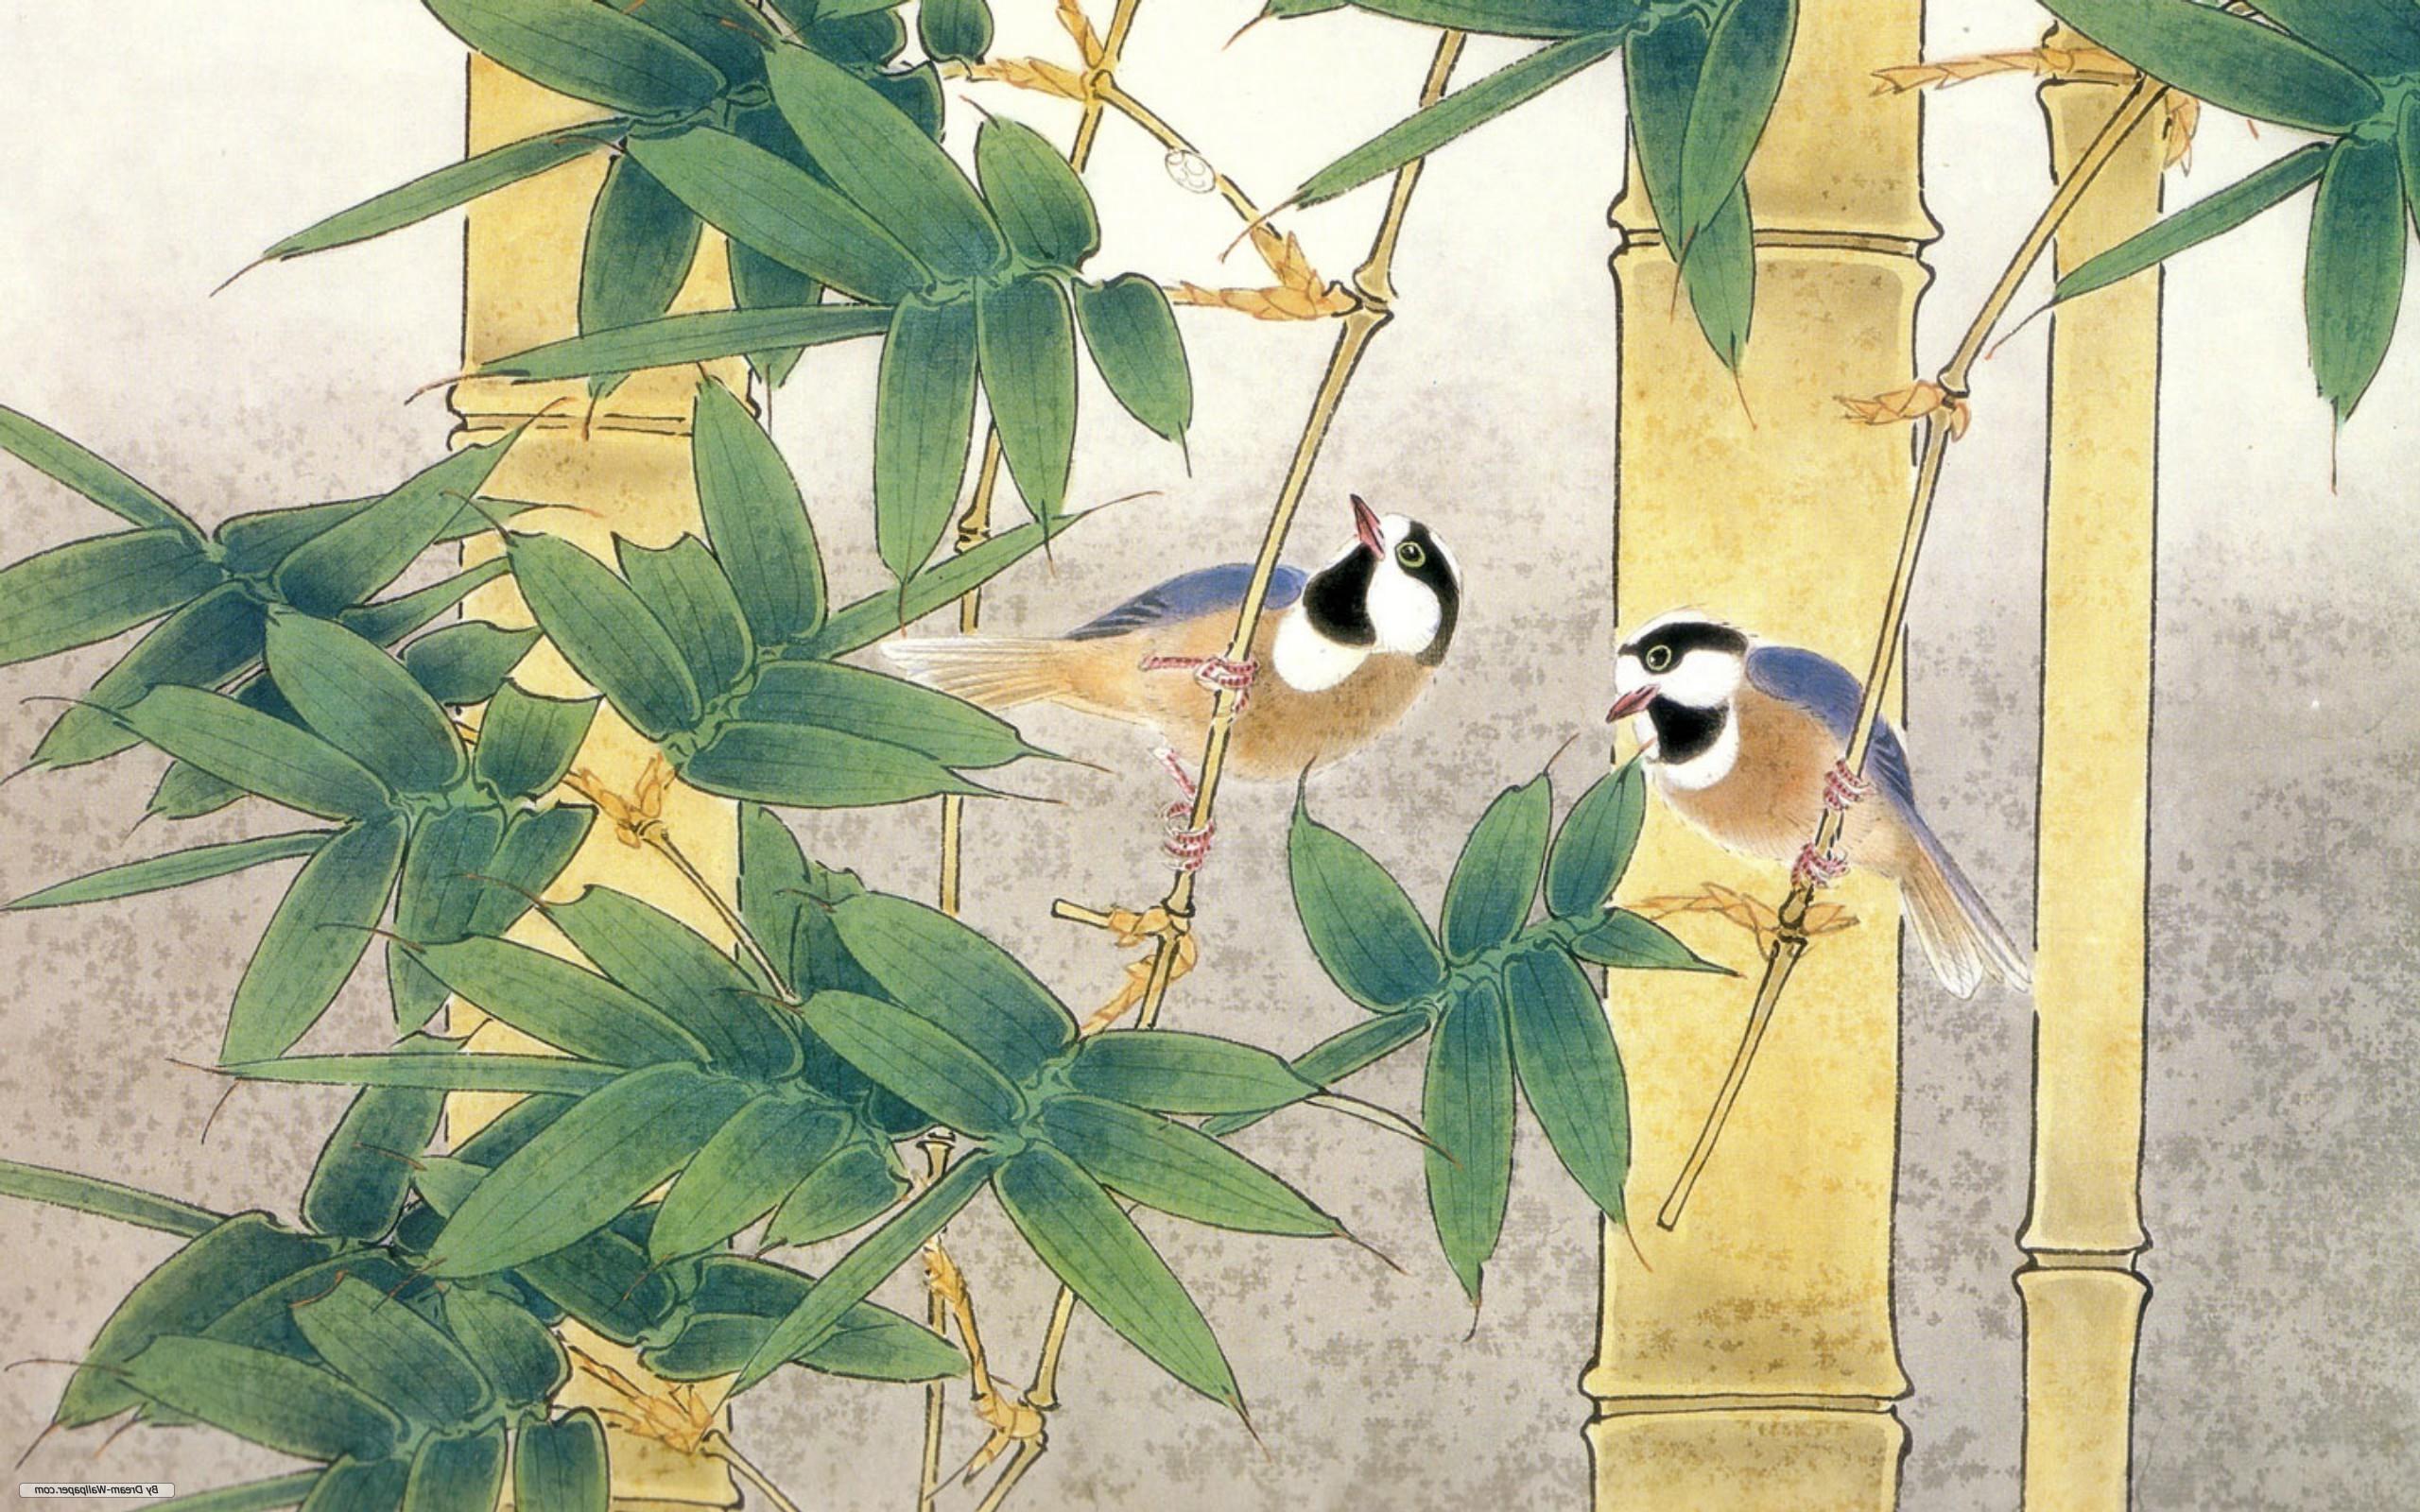 Wallpaper : birds, nature, branch, green, jungle, bamboo, color ...